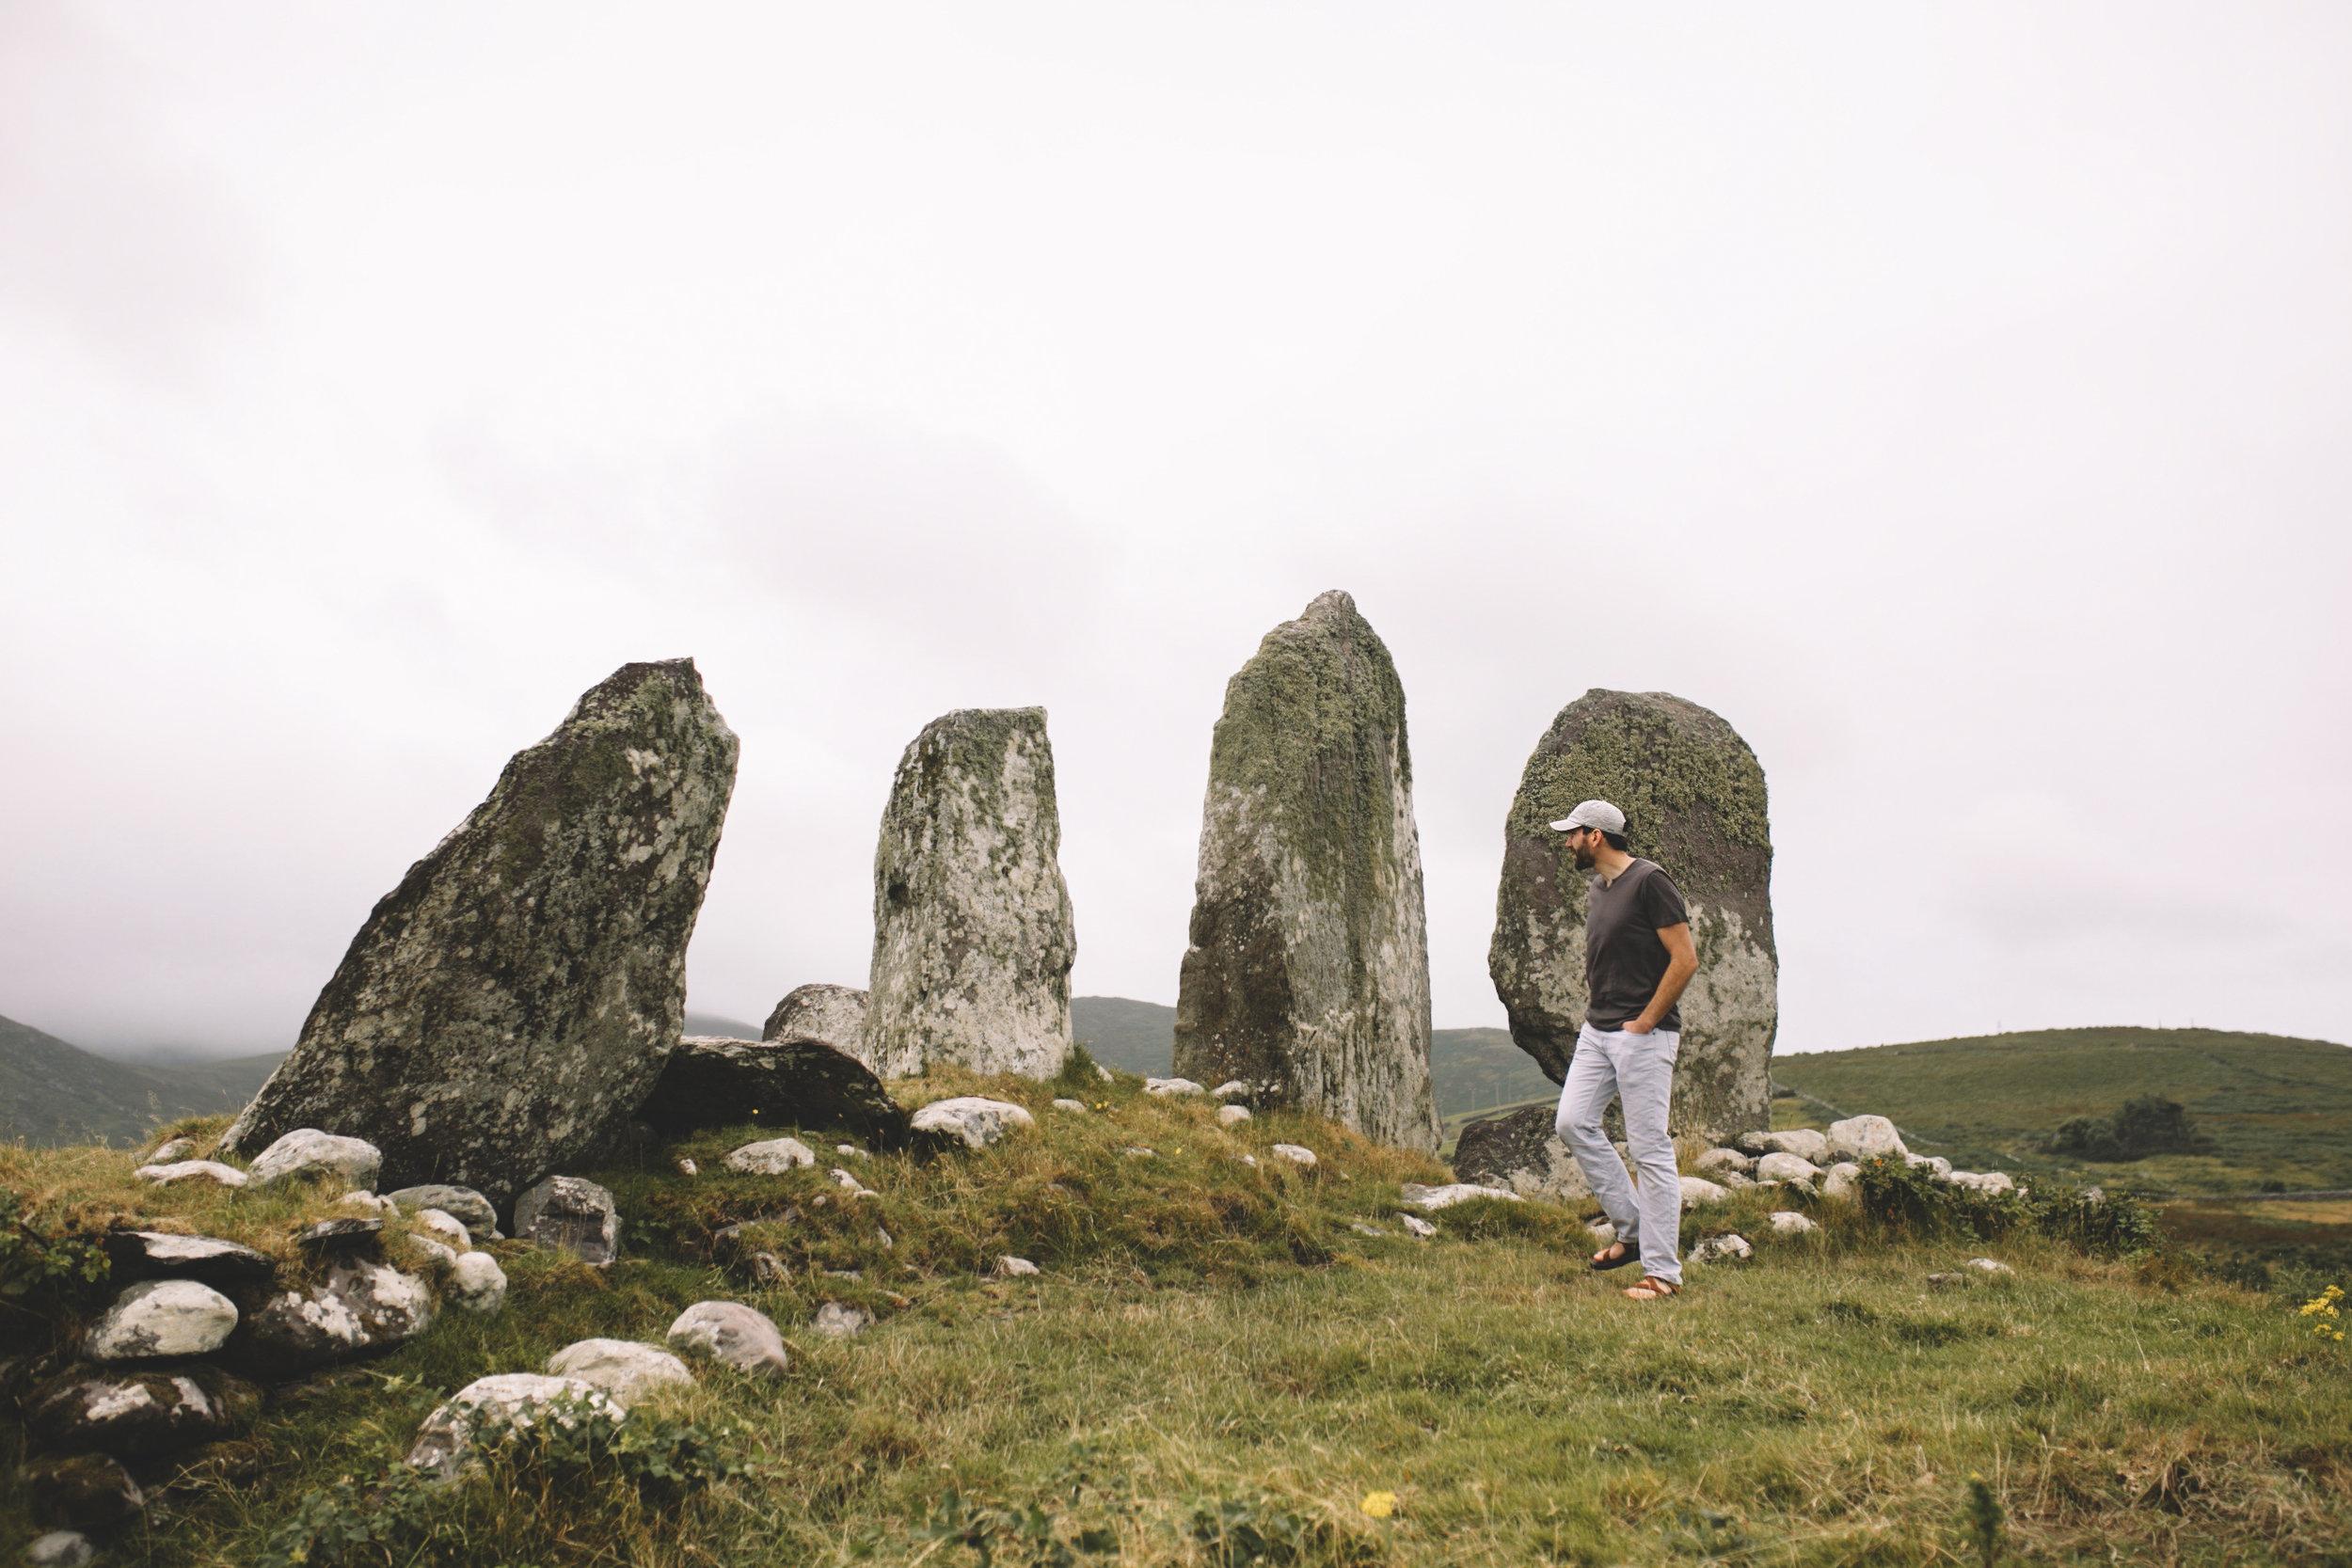 10 Tear Anniversary Trip - Ballinskelligs Ireland + Castle  (166 of 197).jpg